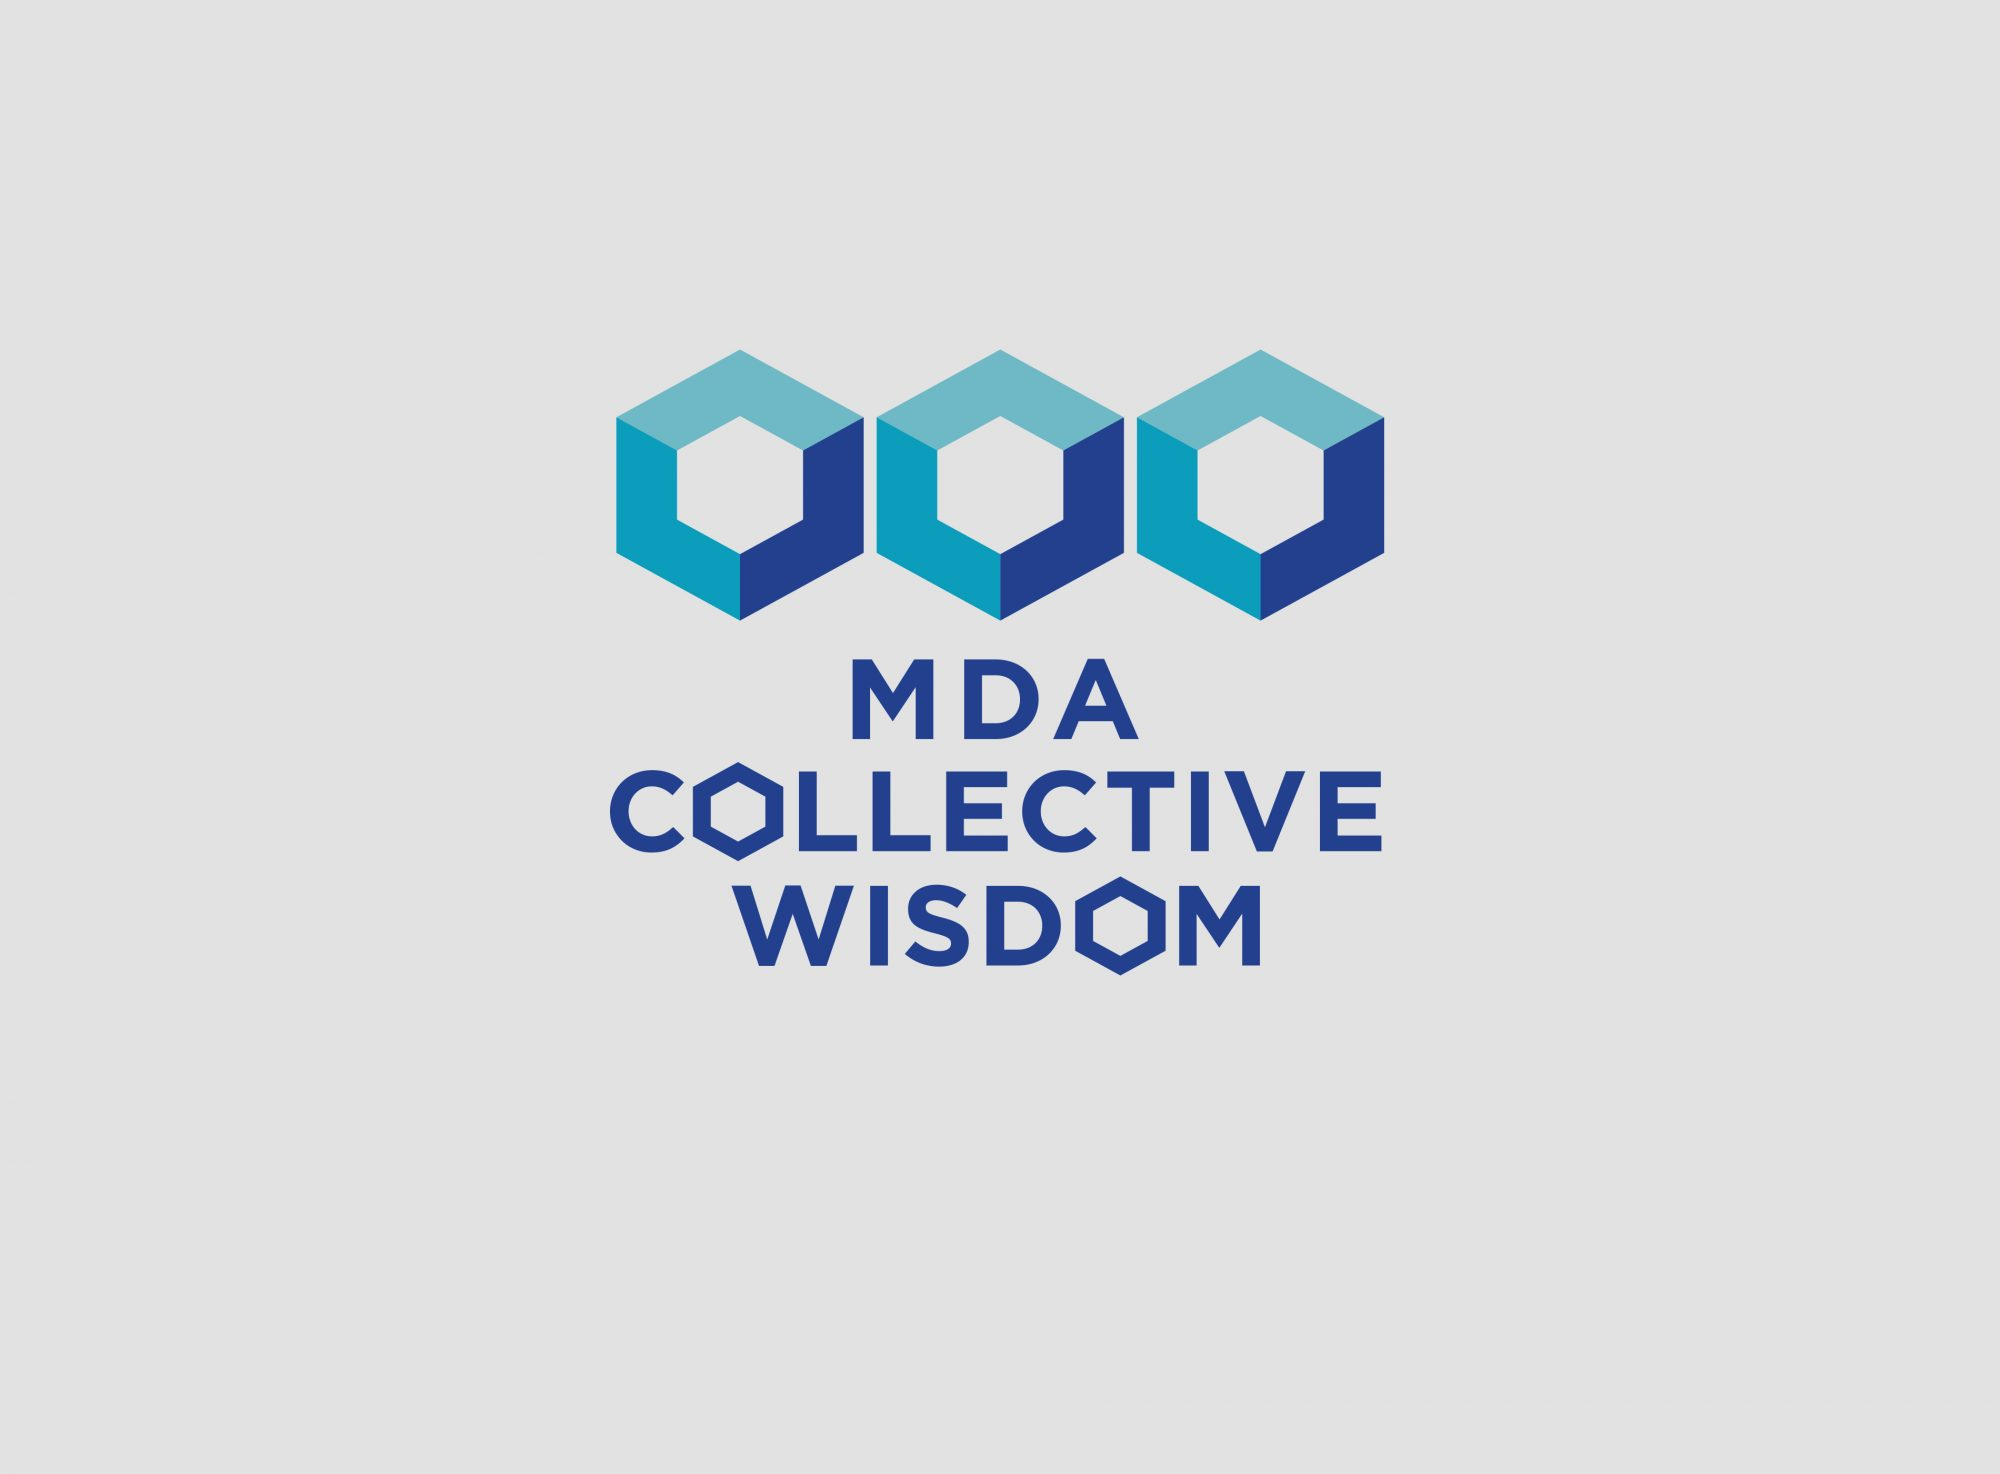 MDA Collective Wisdom Logo Brand Concept